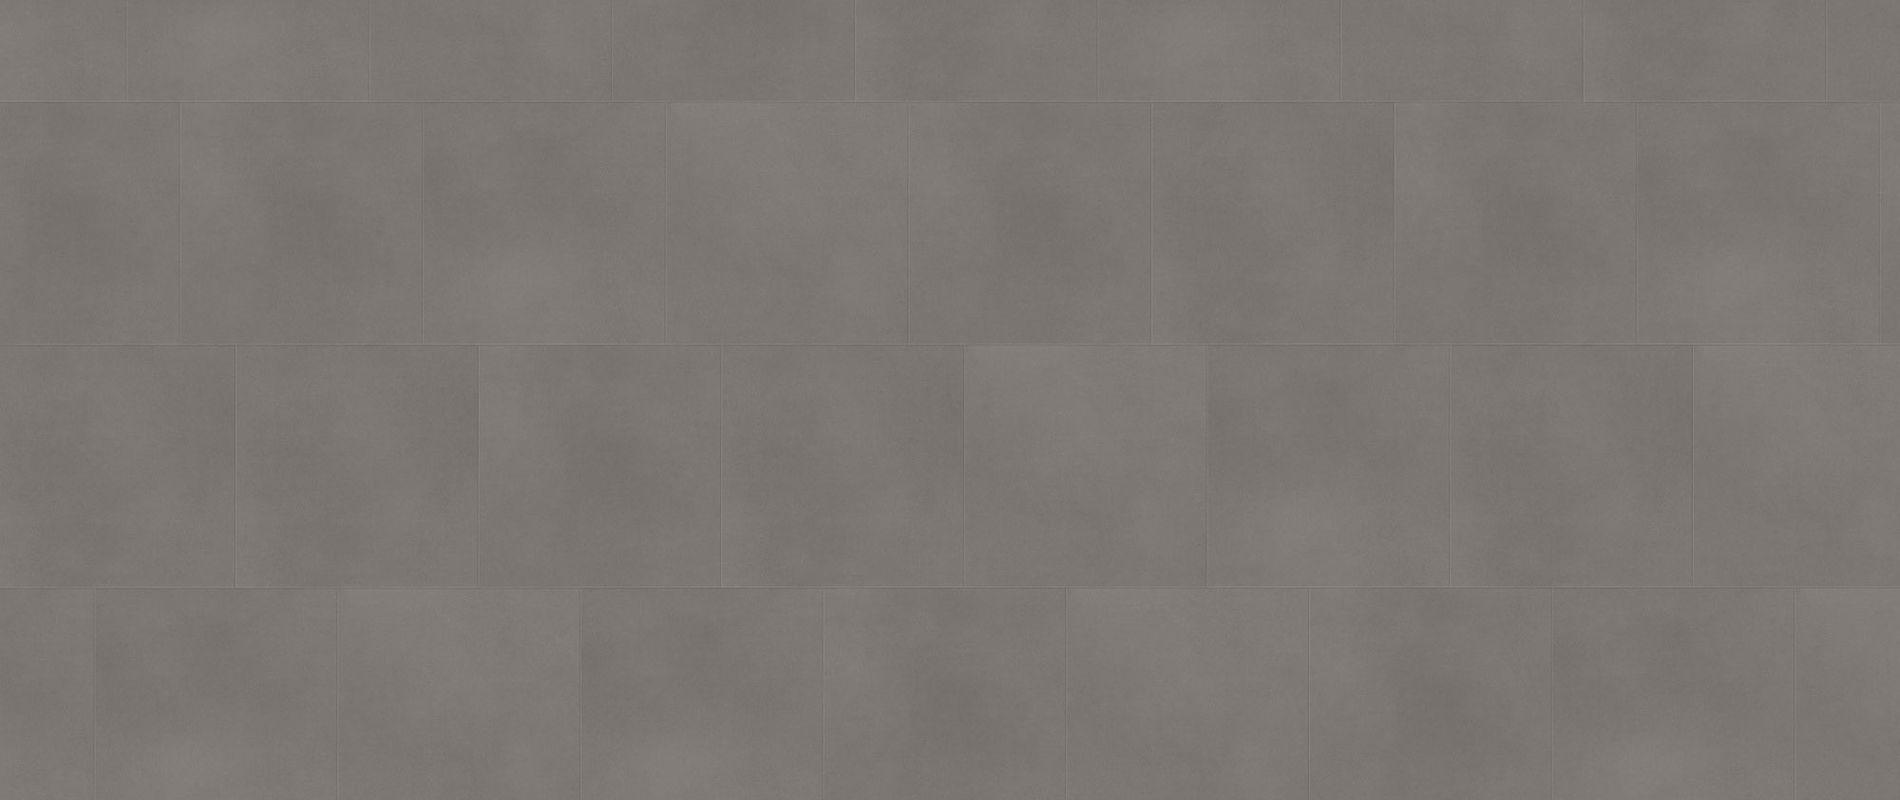 Виниловая плитка Wineo - 800 Tile Solid Grey (DB000097-1)